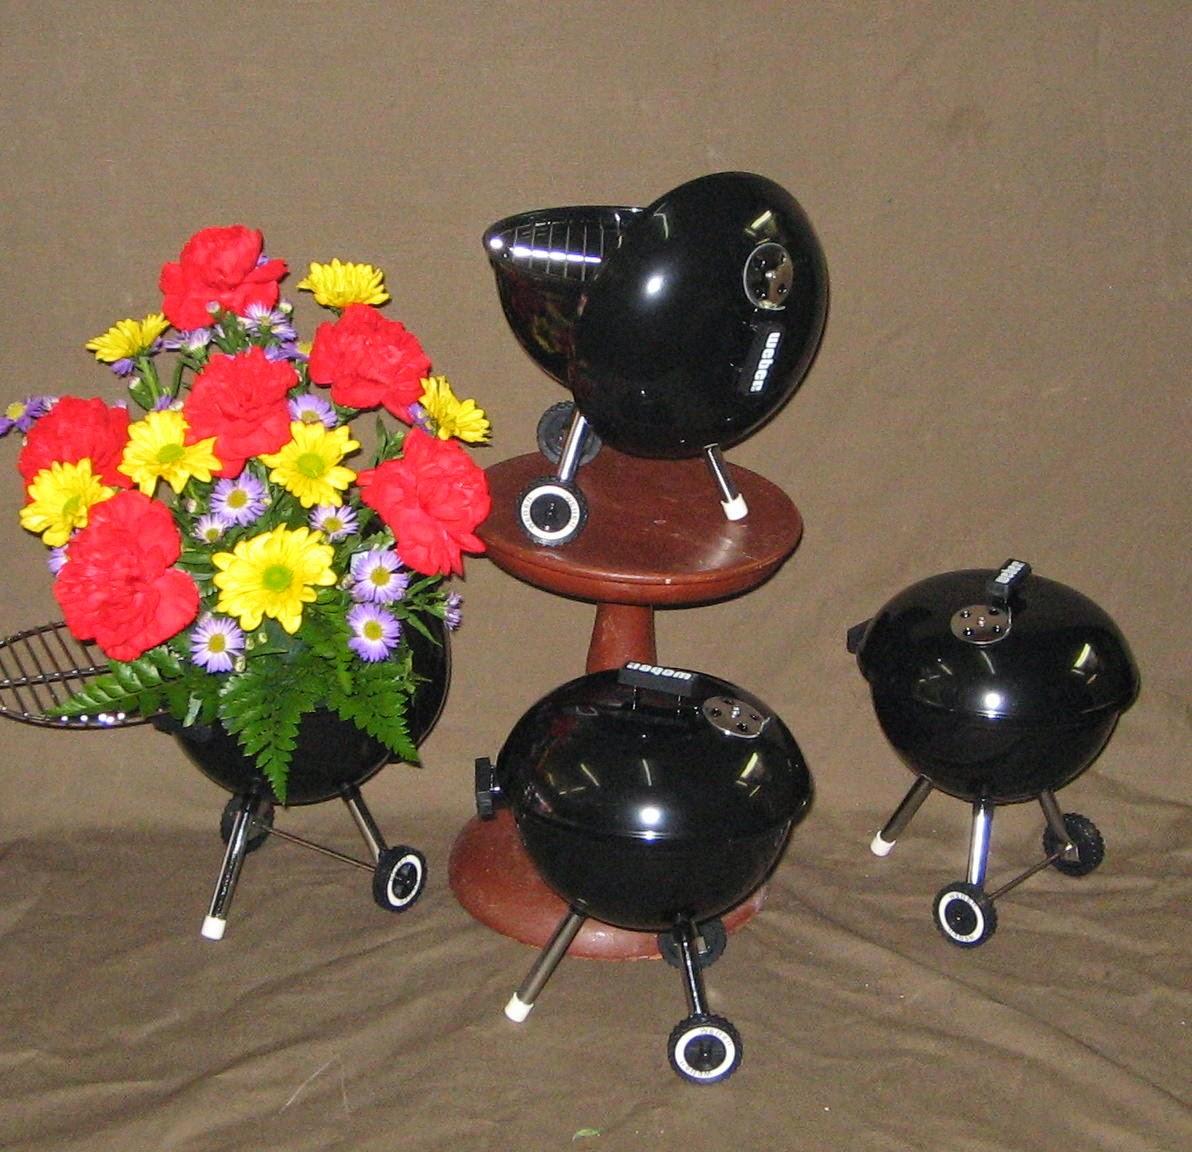 http://www.larose.com/wholesale-floral-supplies/wholesale-weber-grill-planter-case-of-12/